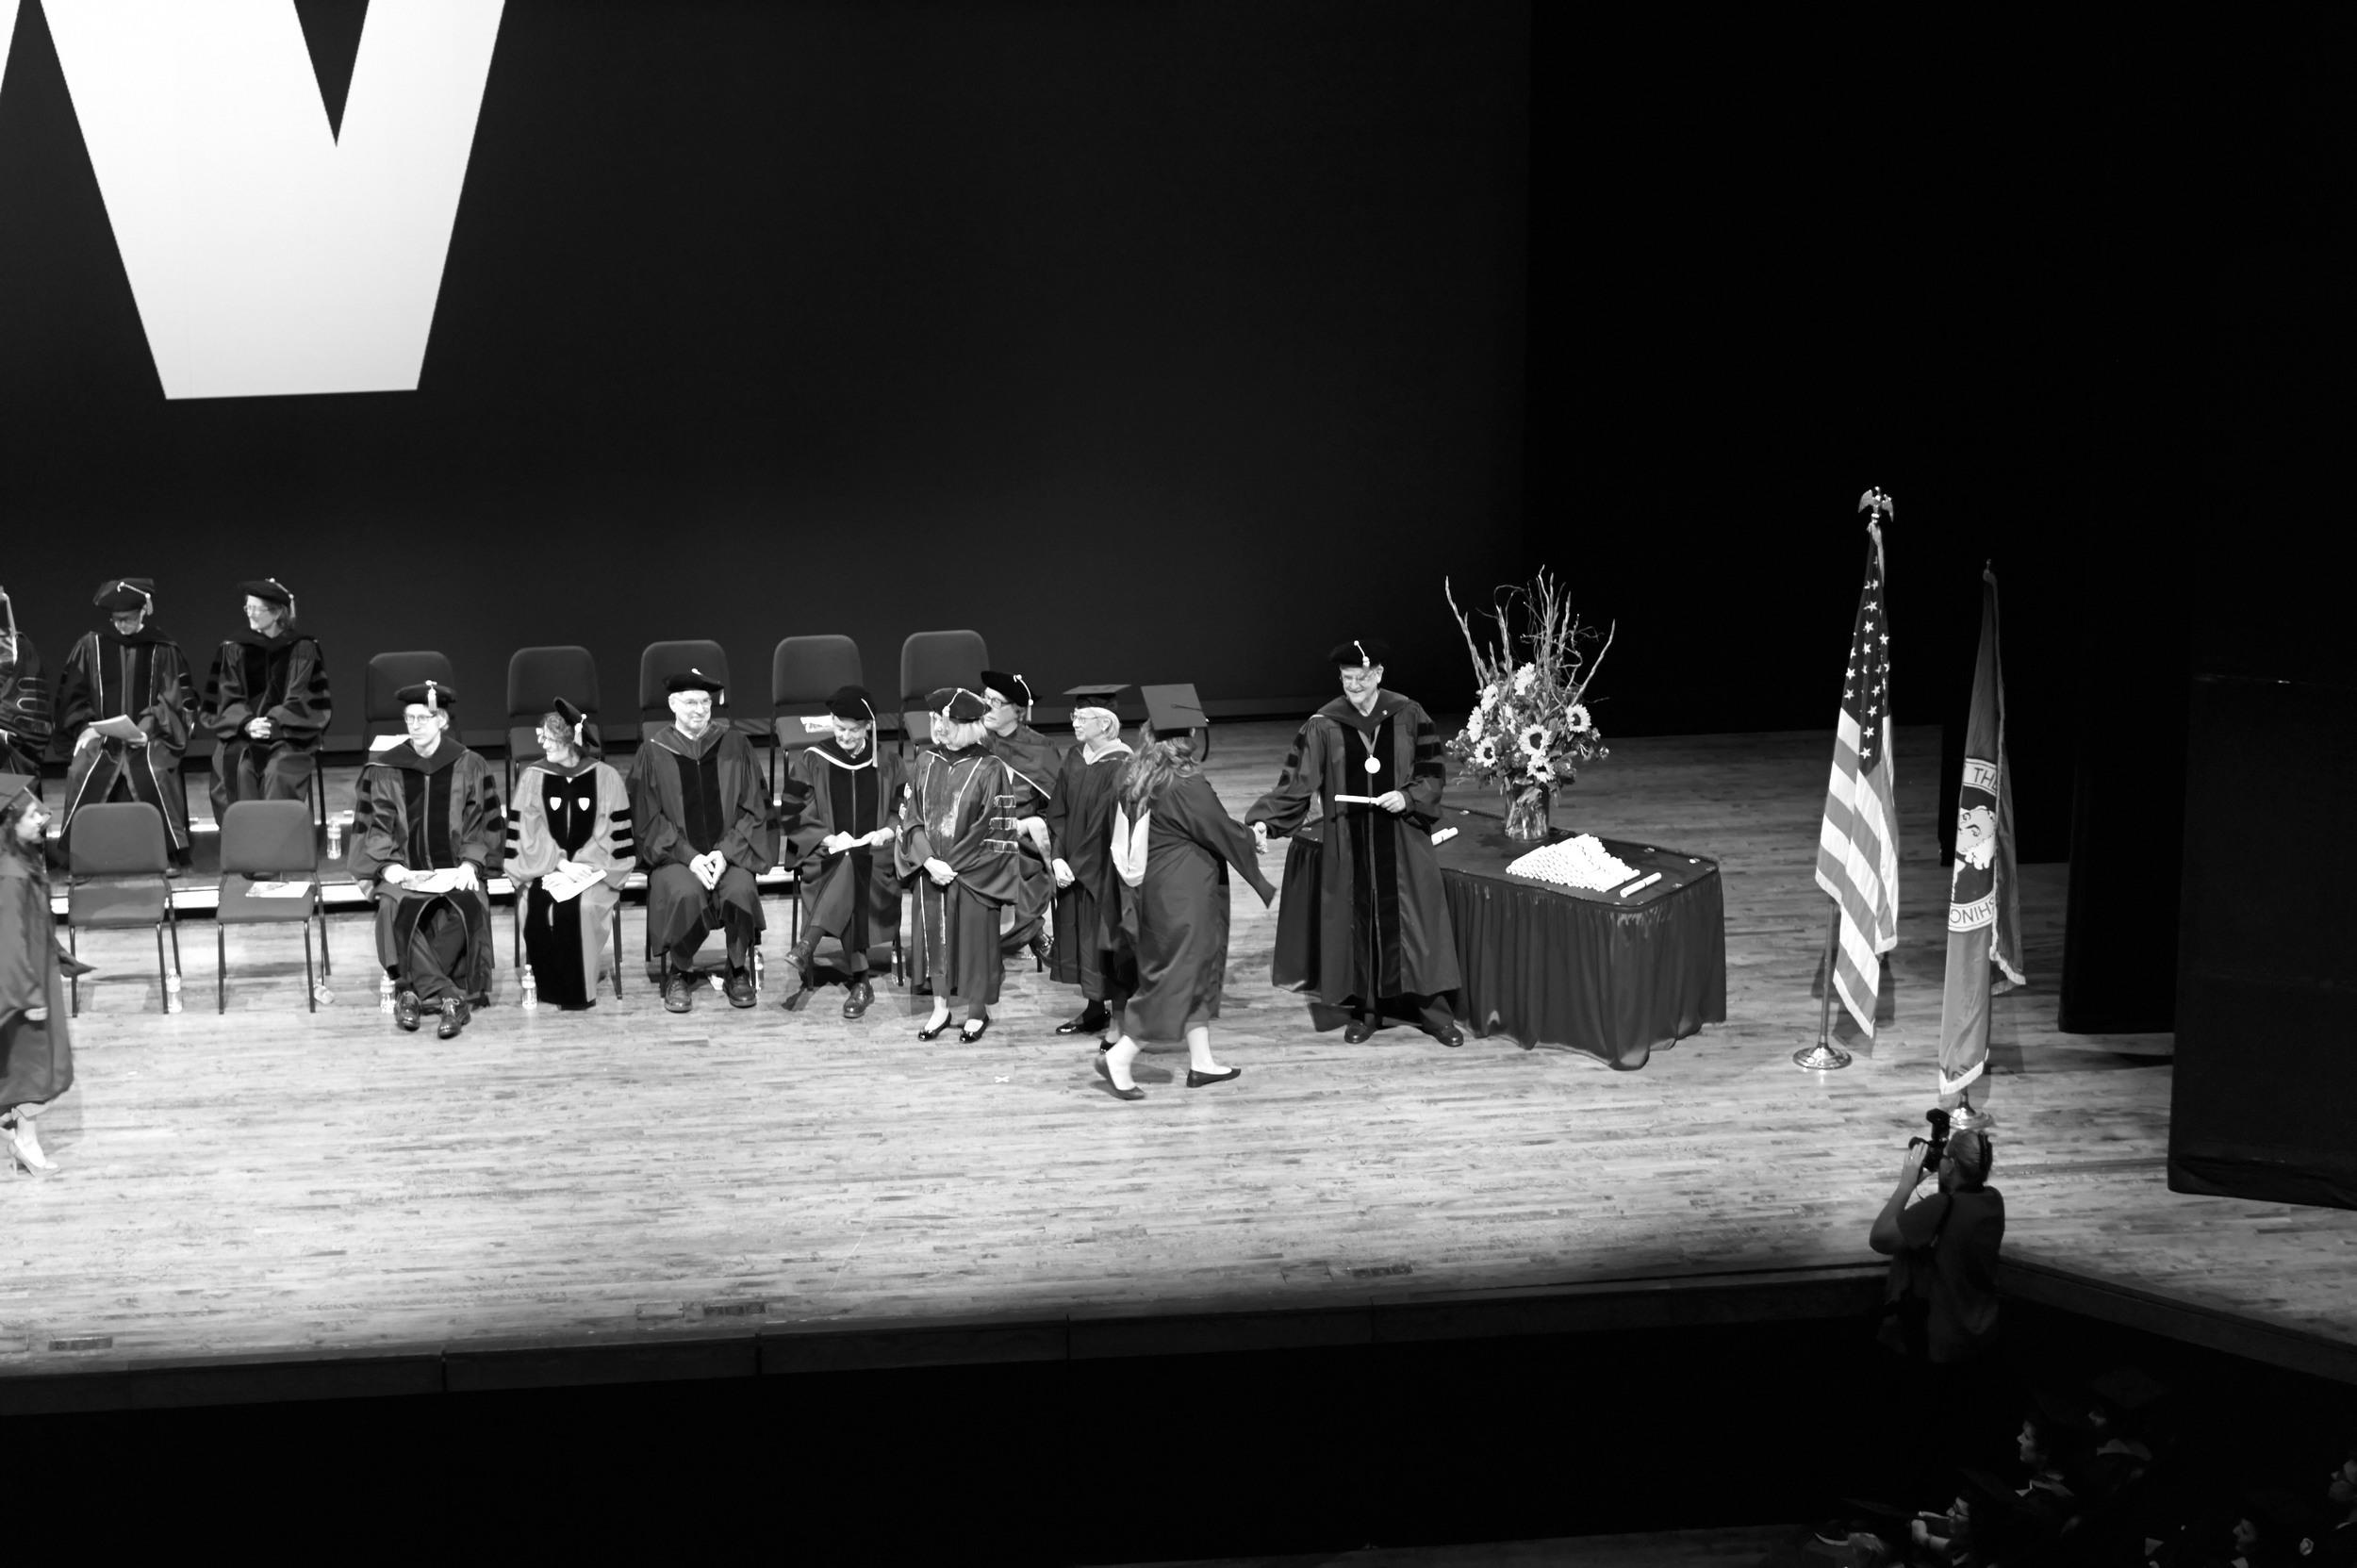 20140612_m9_EvansSchool_Graduation_011_BW.jpg